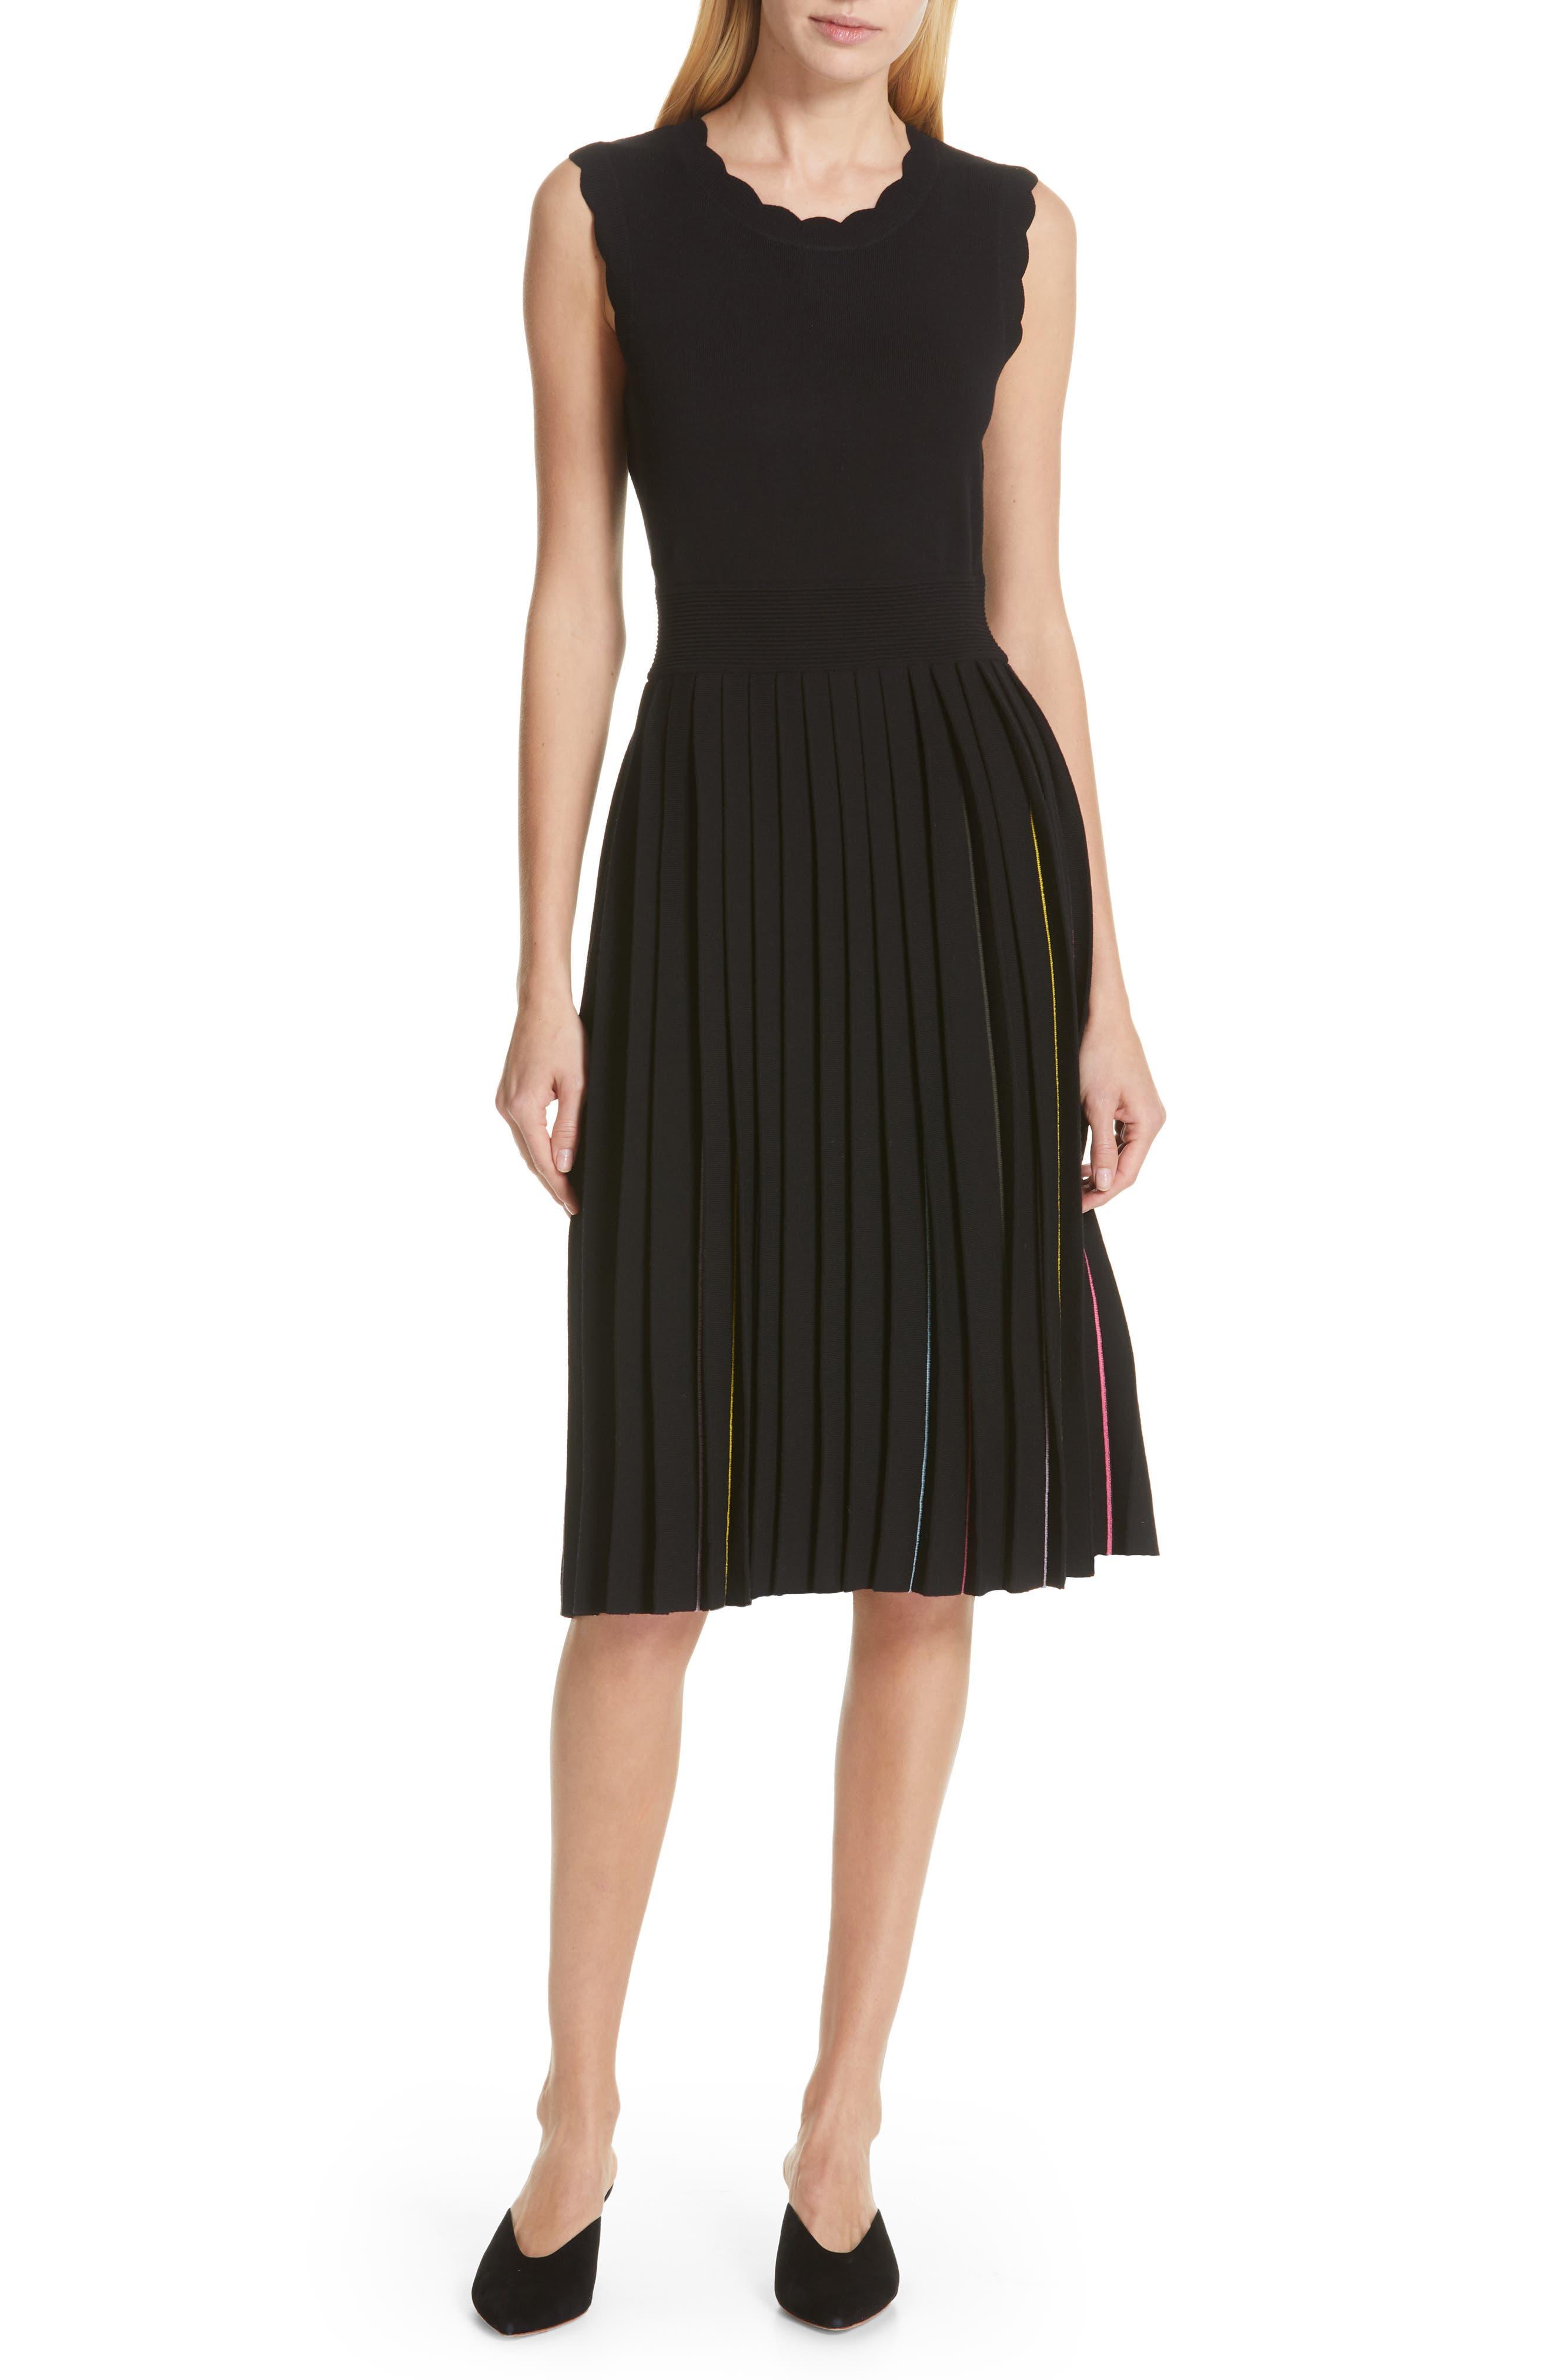 Kate Spade New York Scallop Pleat Sweater Dress, Black